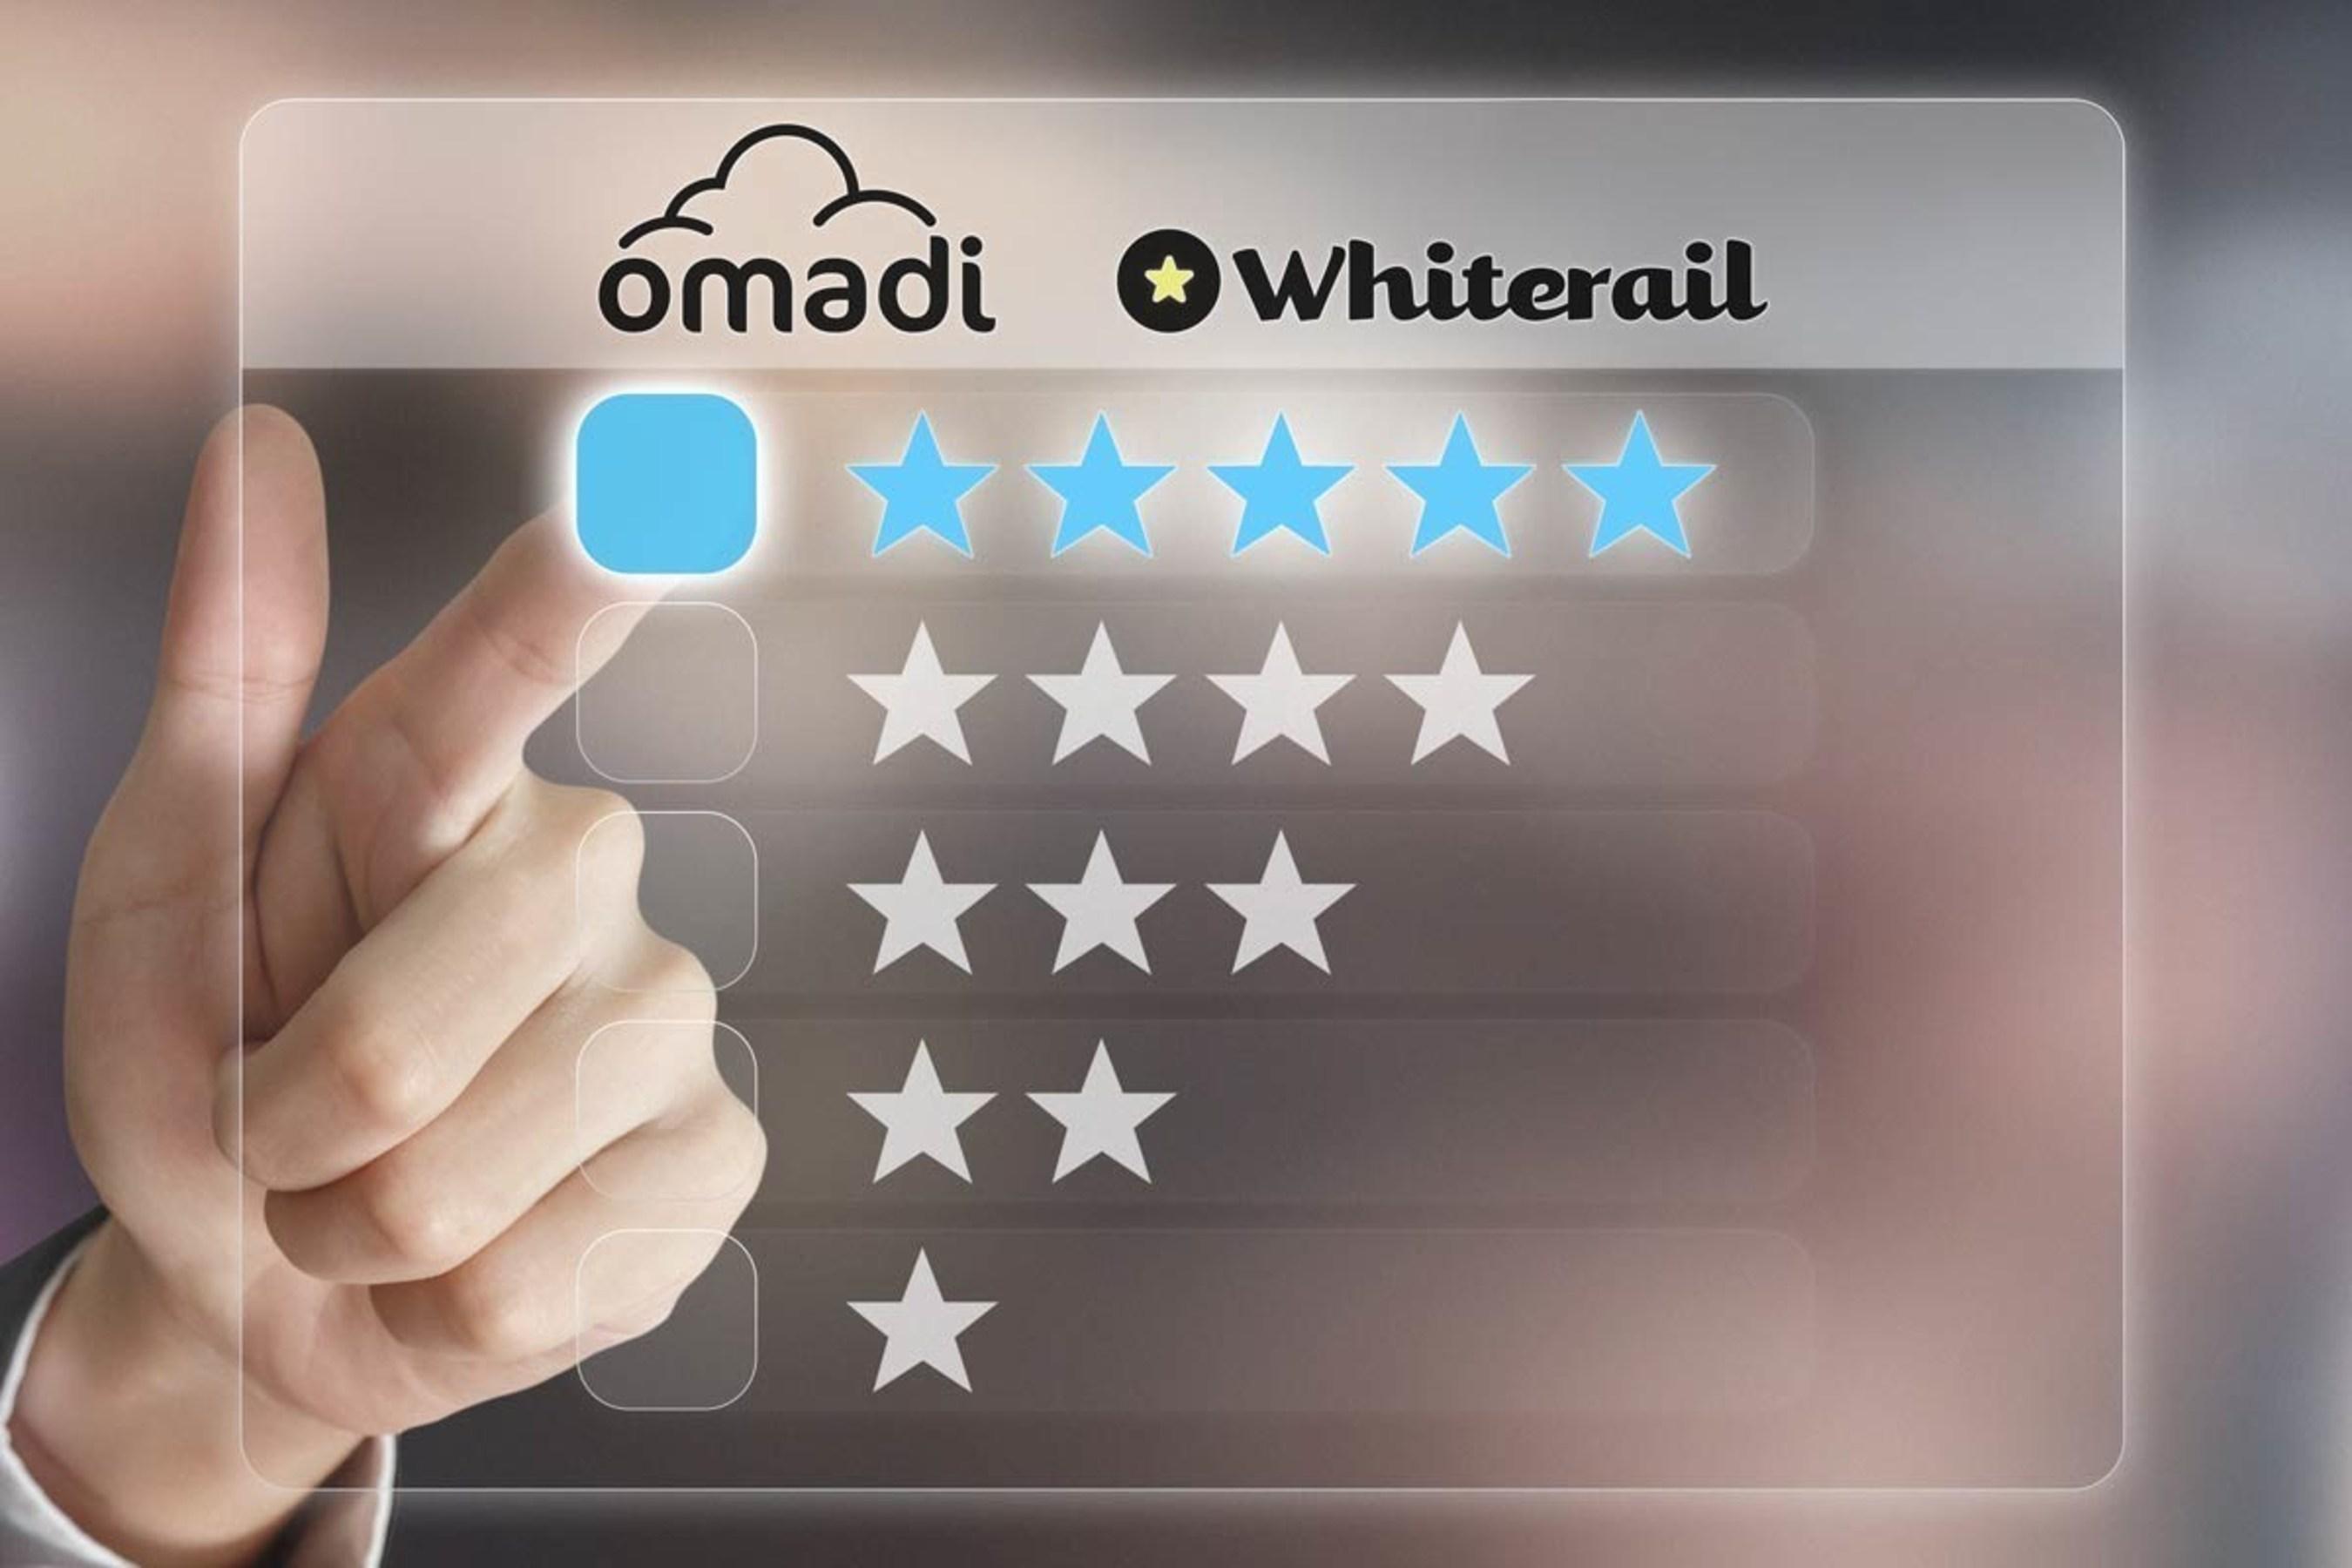 Omadi & Whiterail Integration